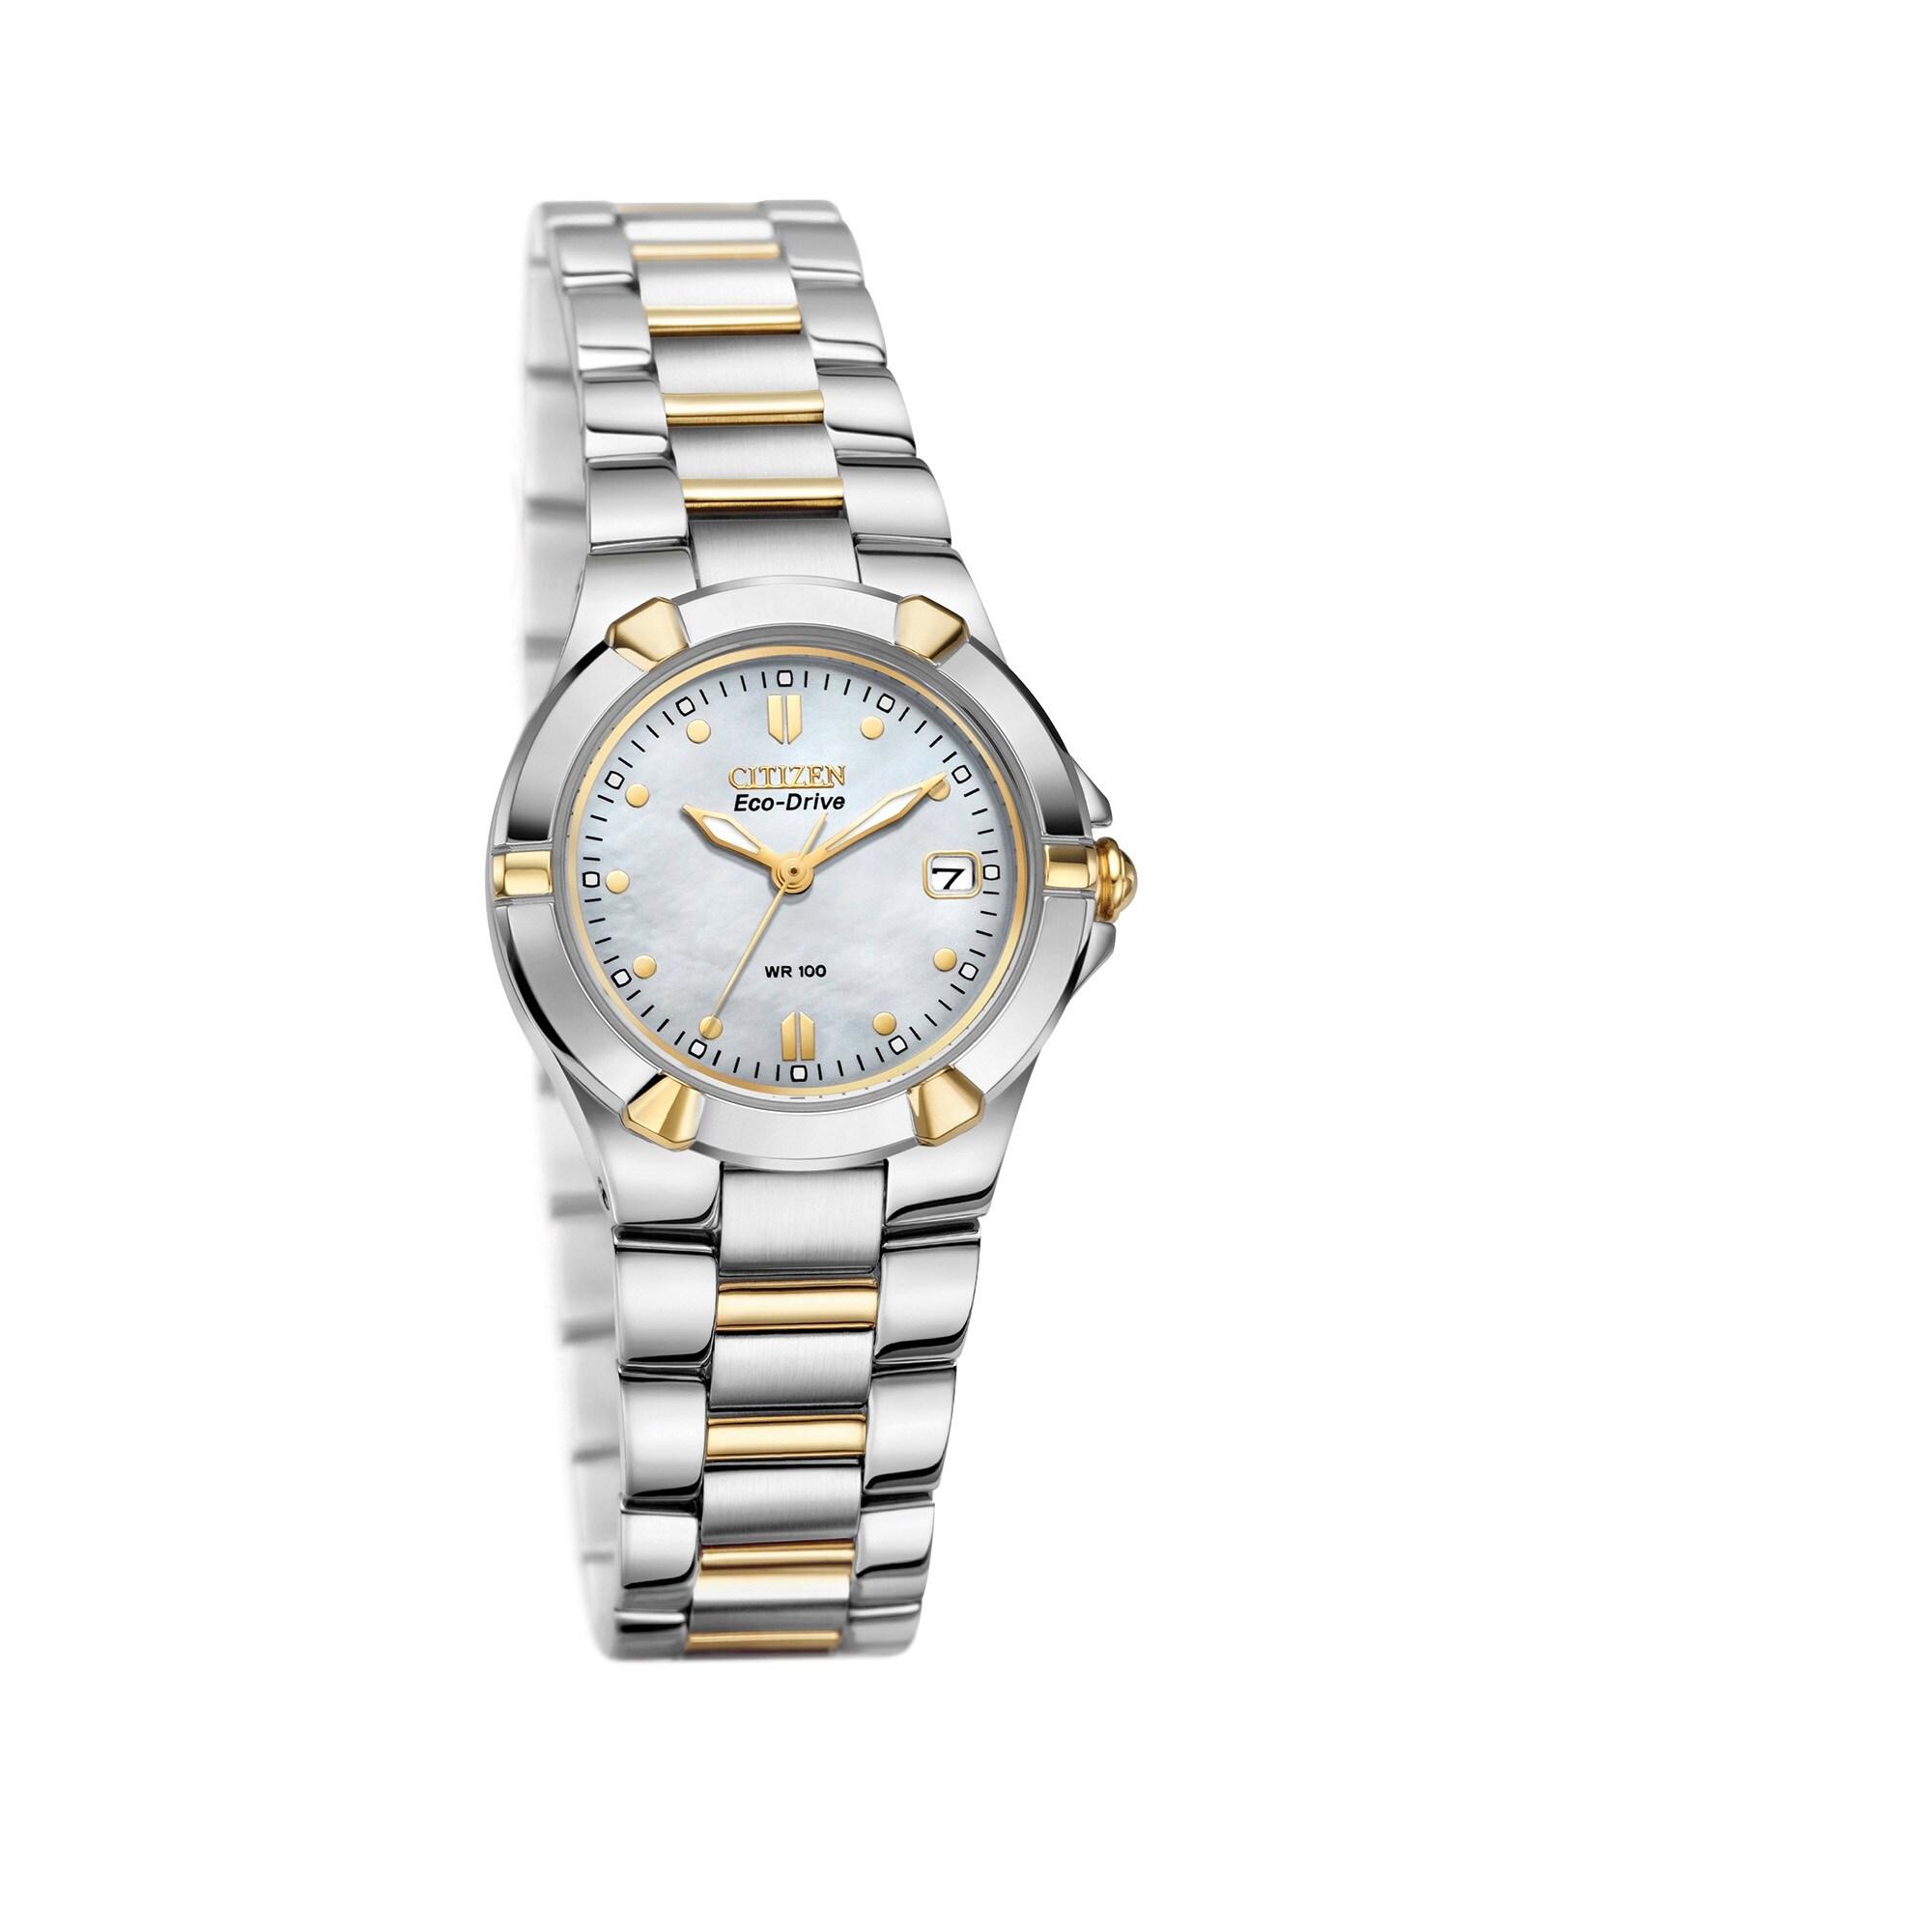 Citizen Women's EW1534-57D Eco-Drive Riva Watch (The ulti...